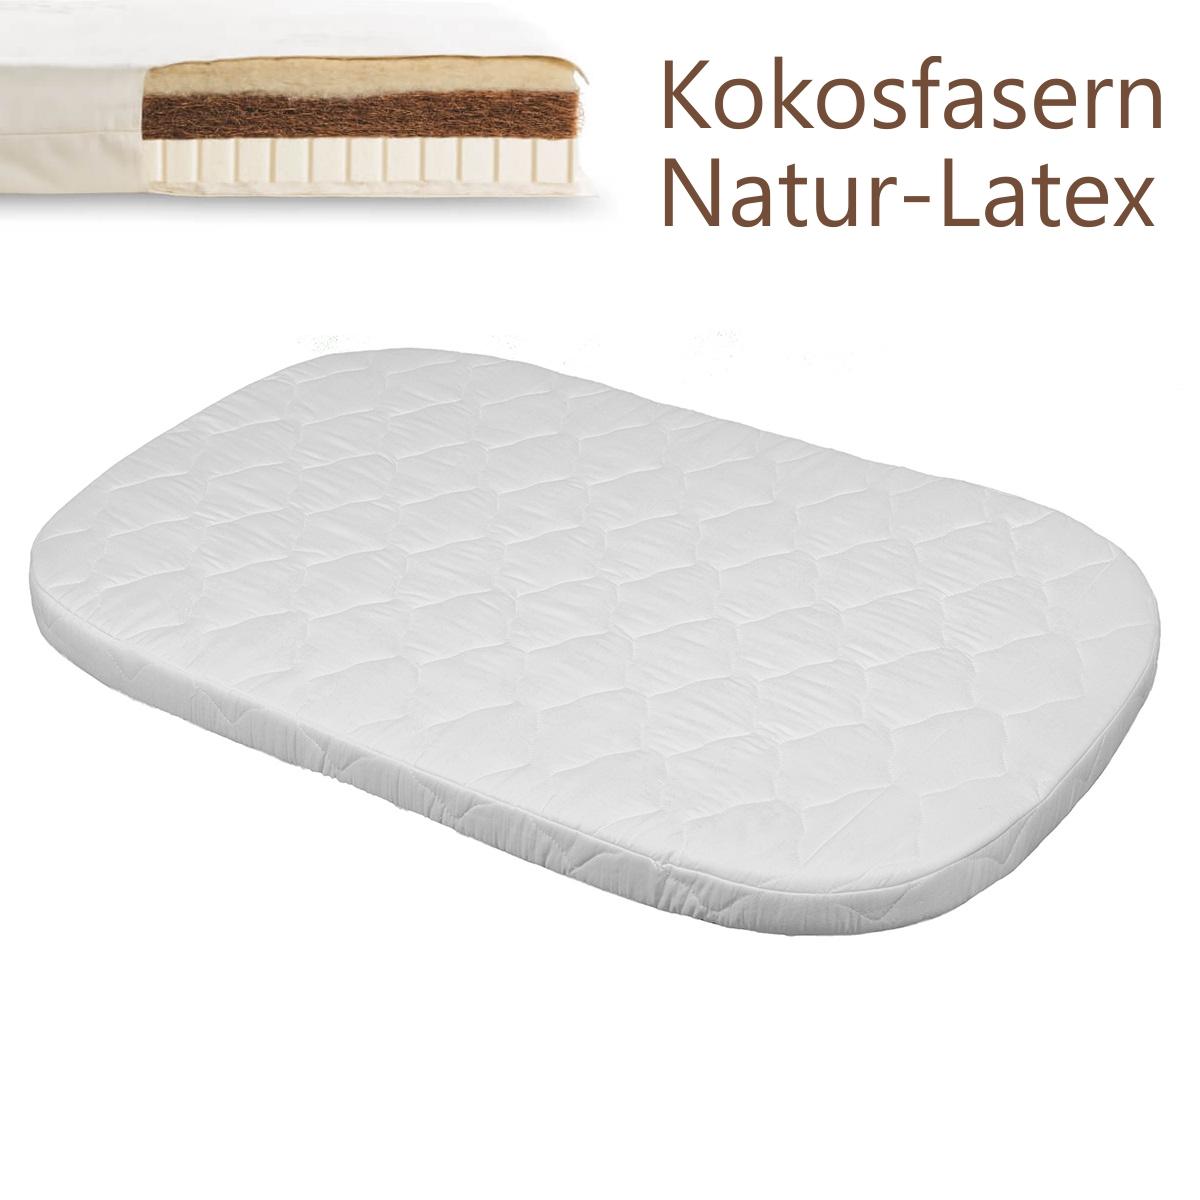 tweeto Wende-Matratze Kokos-Naturlatex 70x120